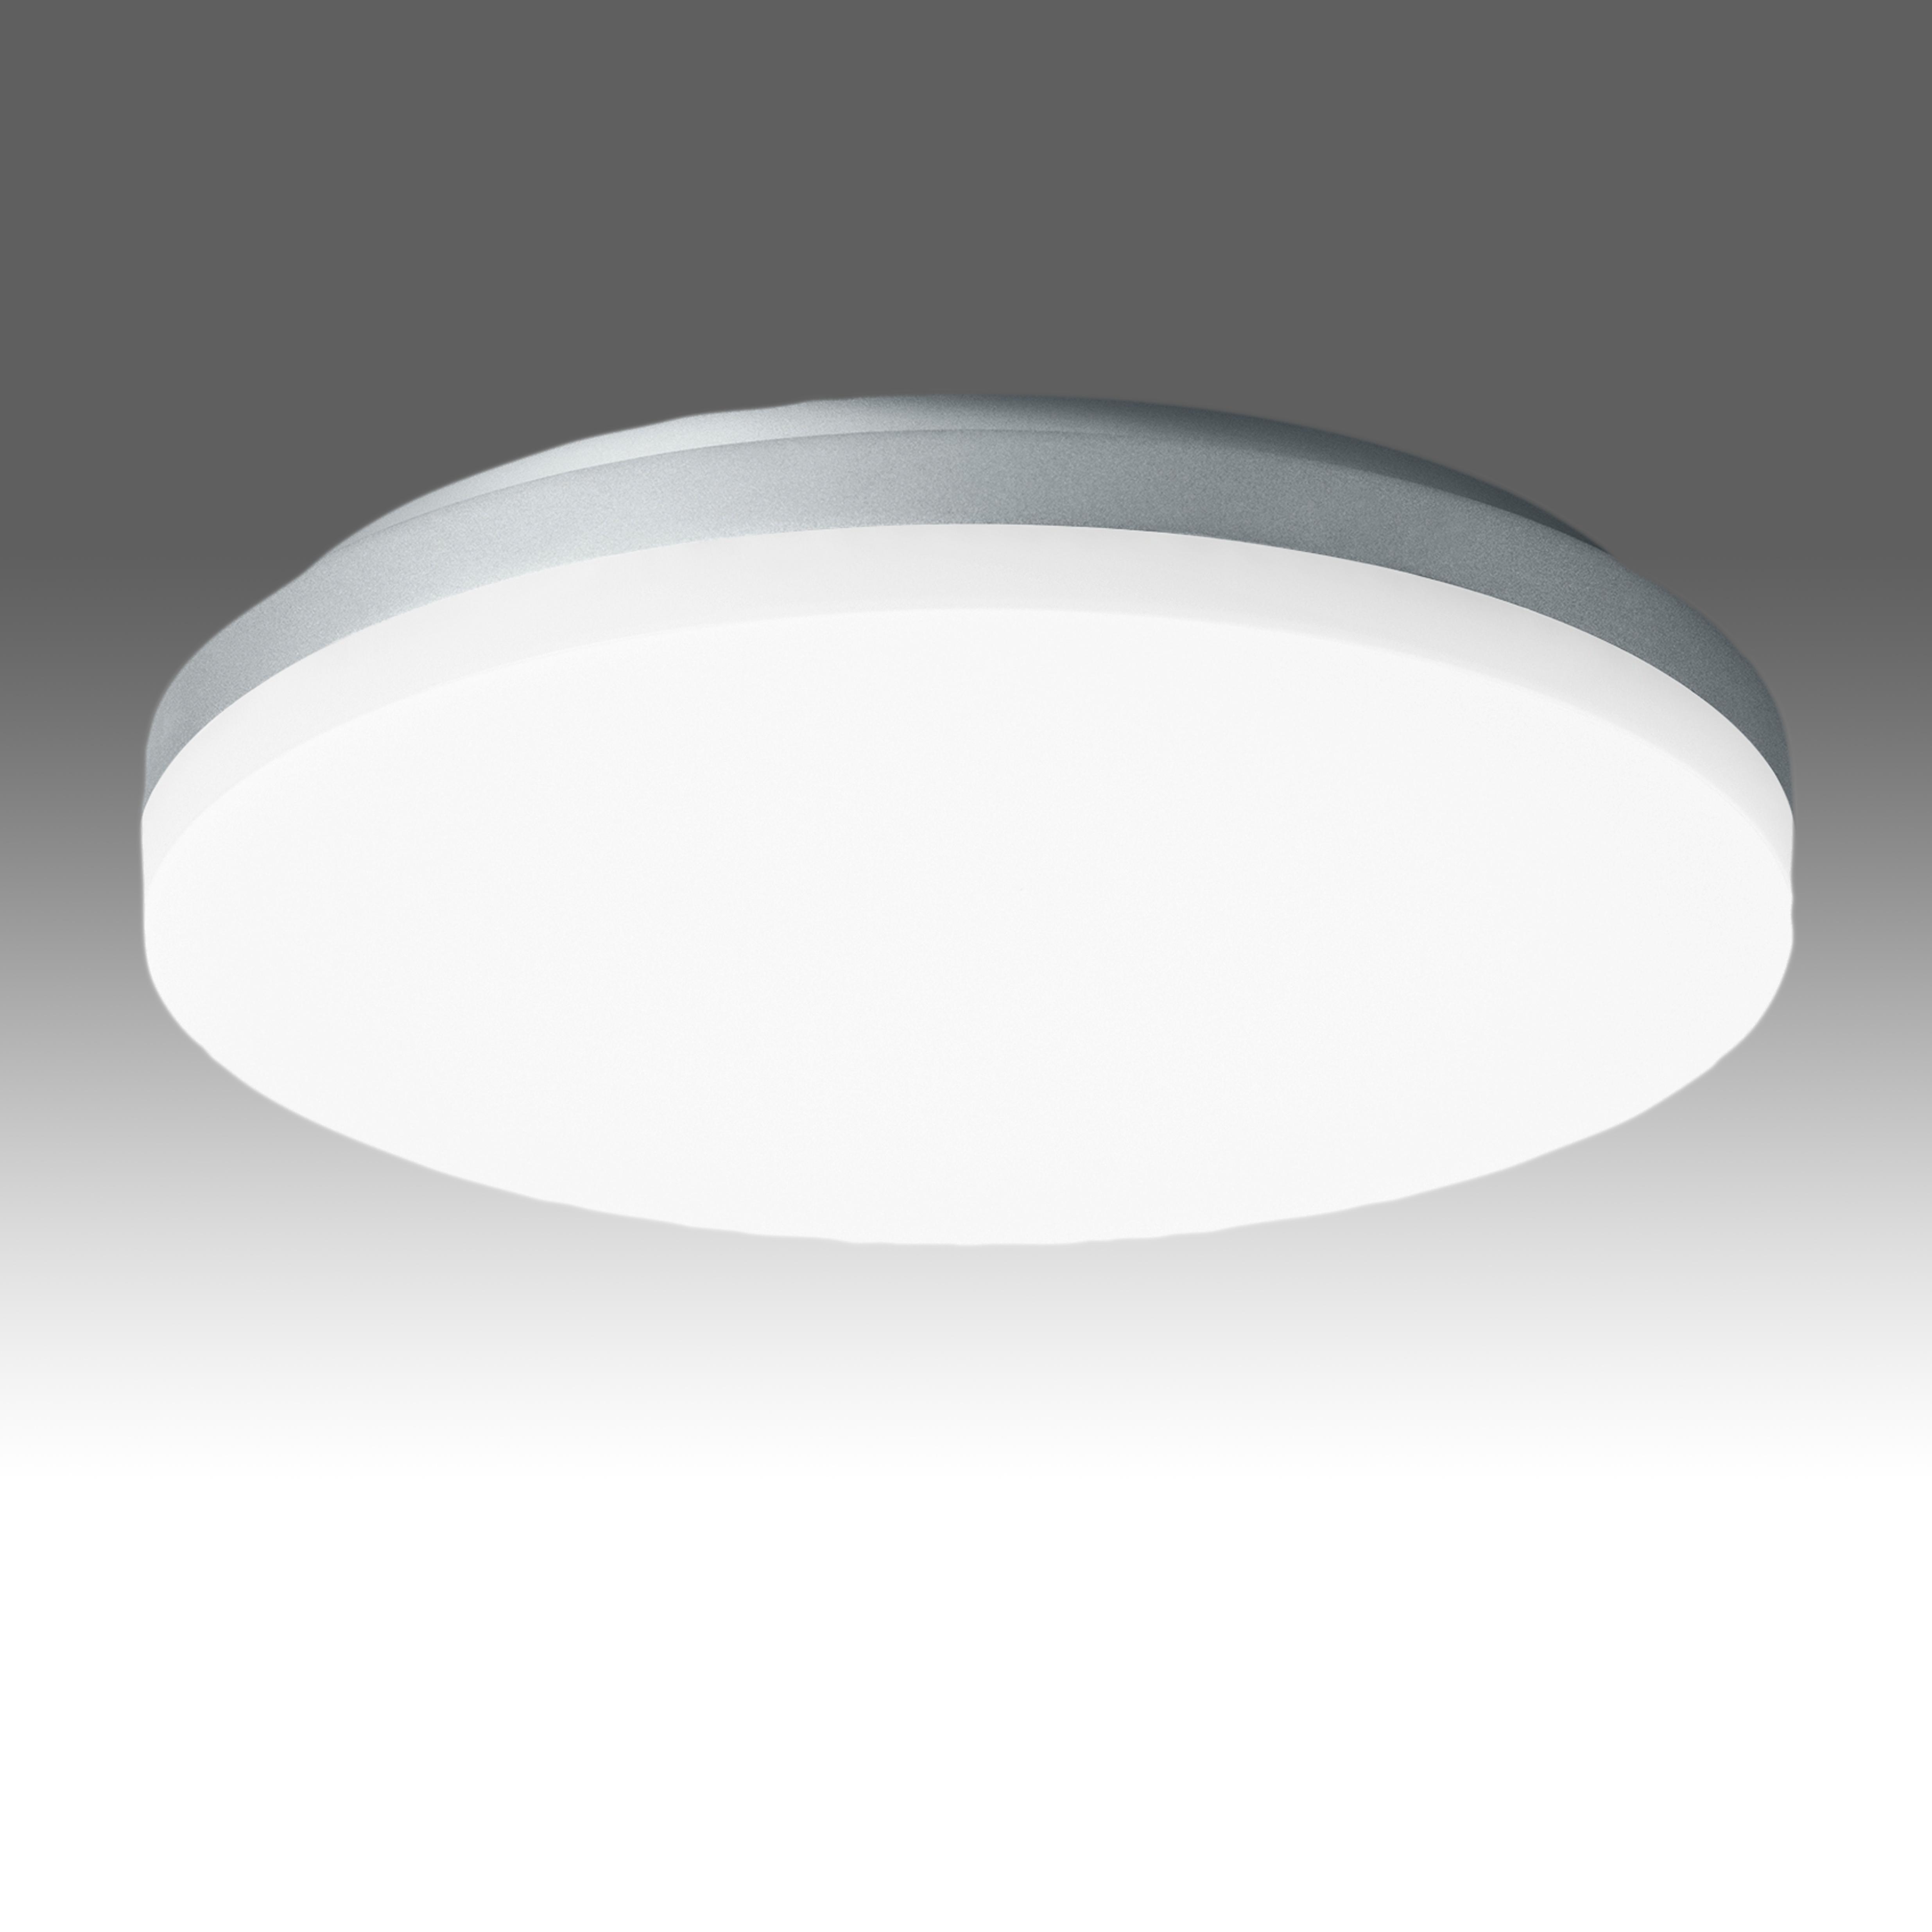 1 Stk Elegance Round III 27W 2800lm 3000K Triac Dim IP20 silber LILE0014--